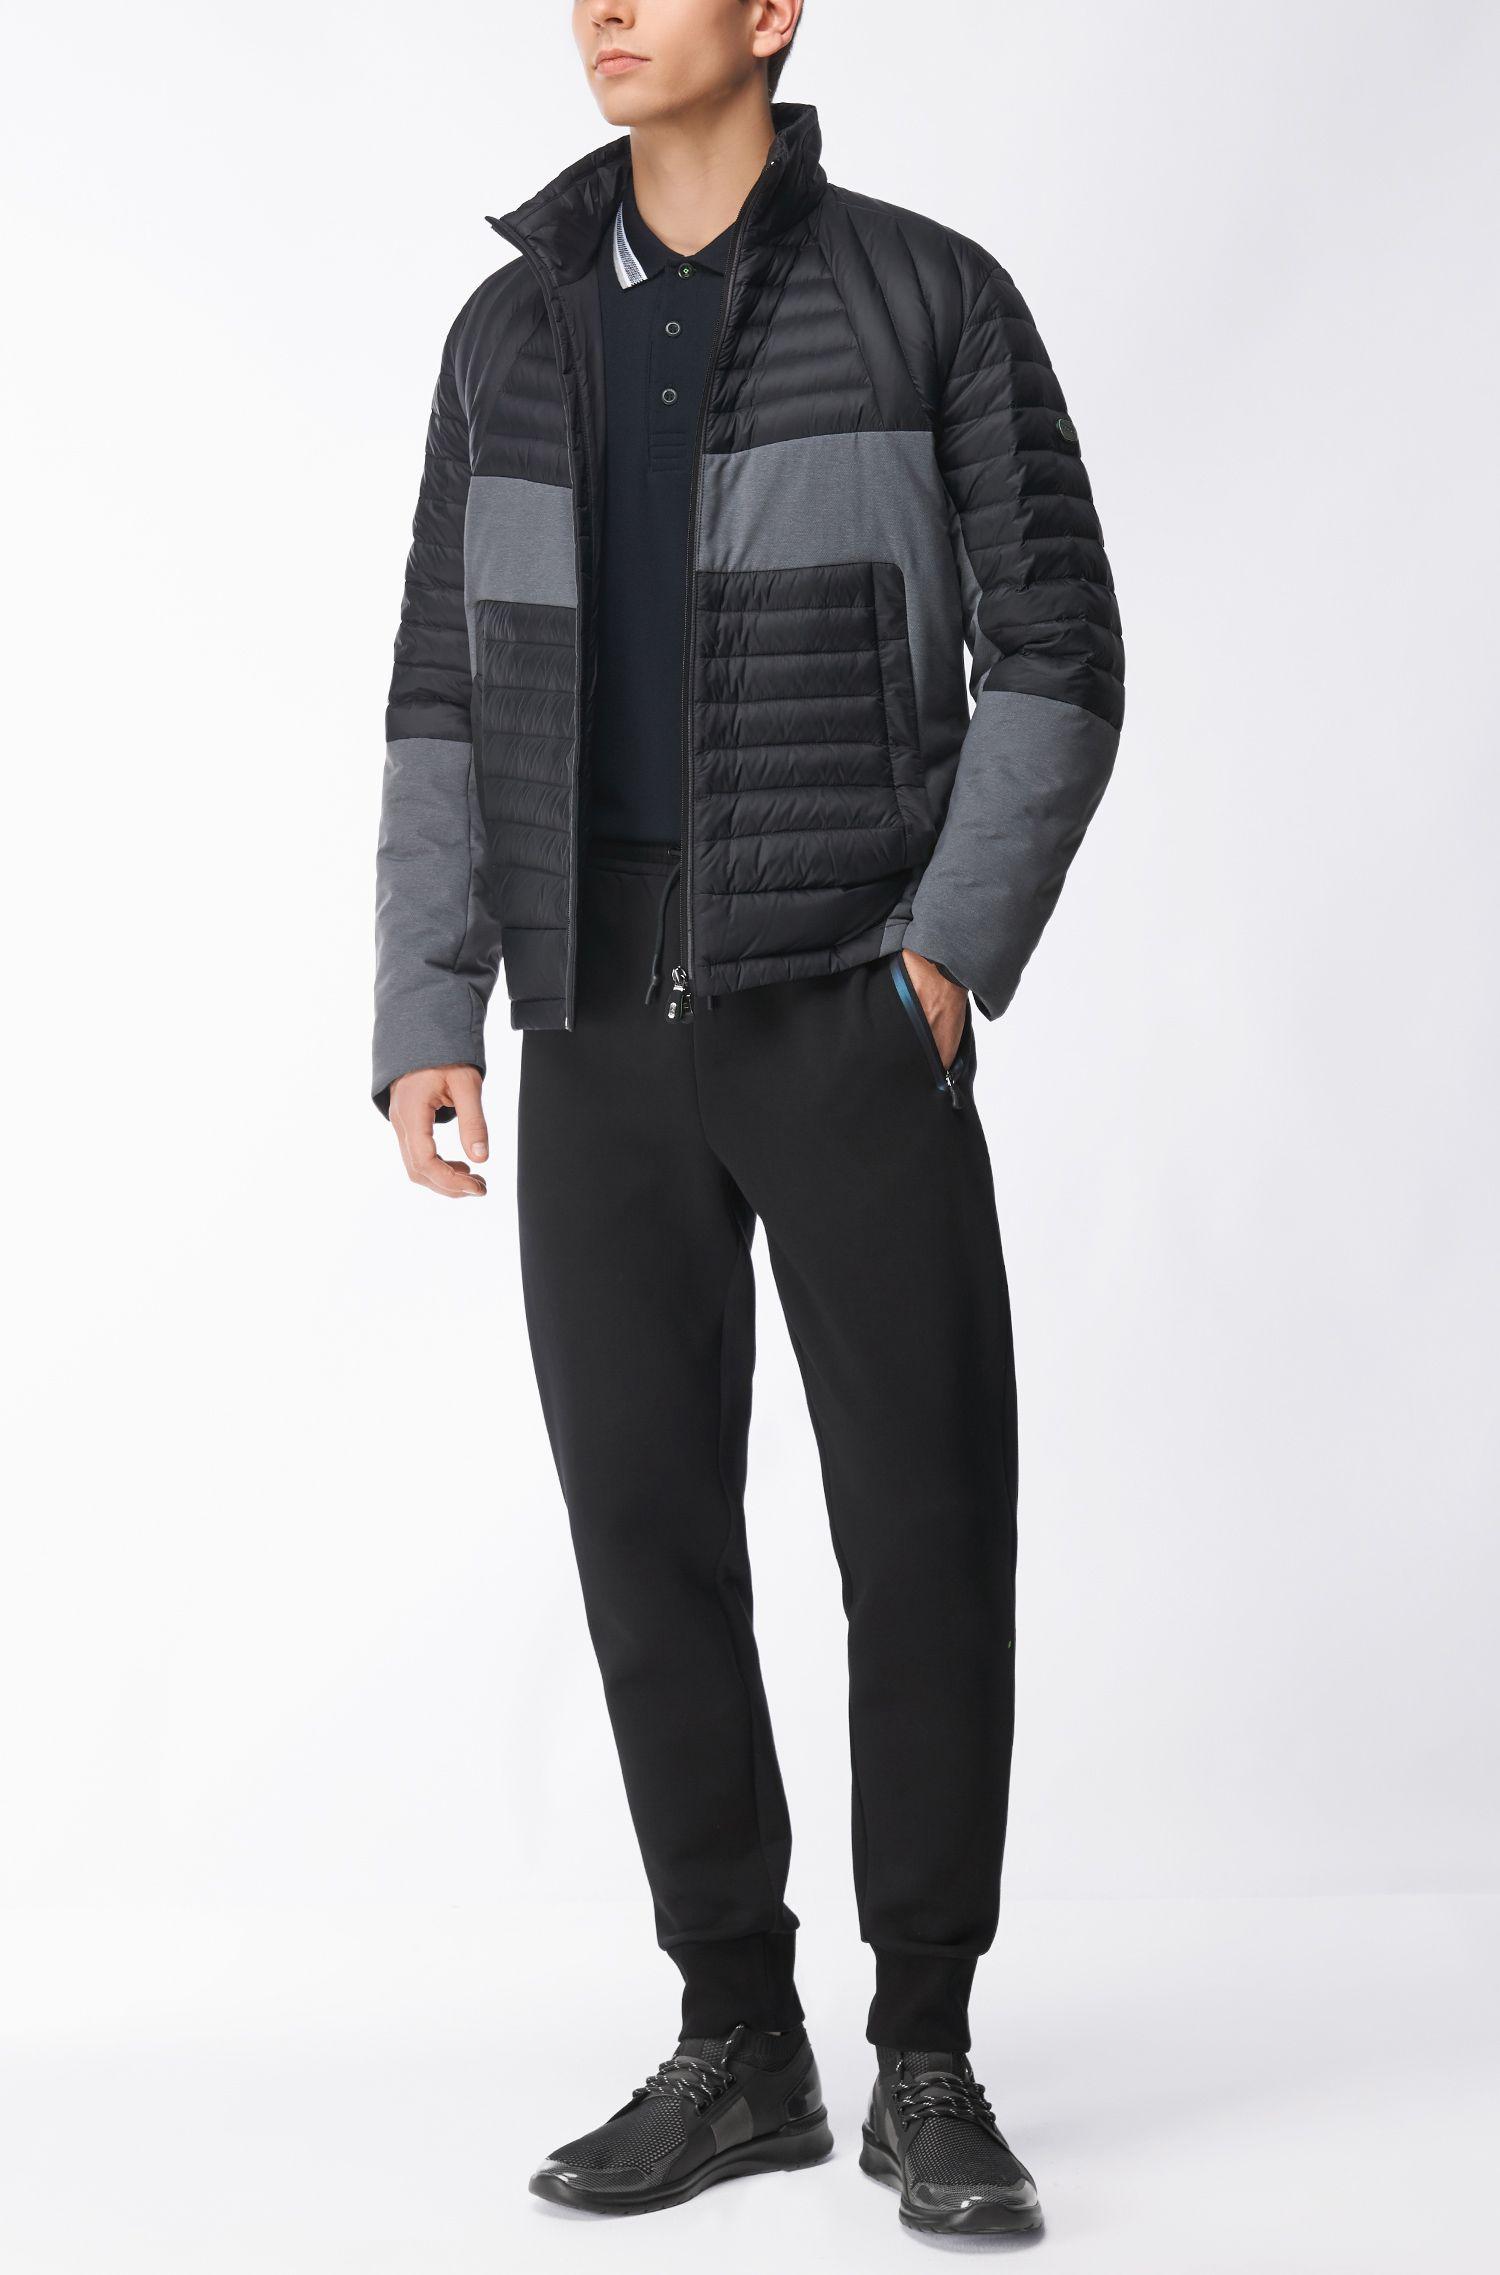 Knit Running Sneaker | Extreme Runn Knit